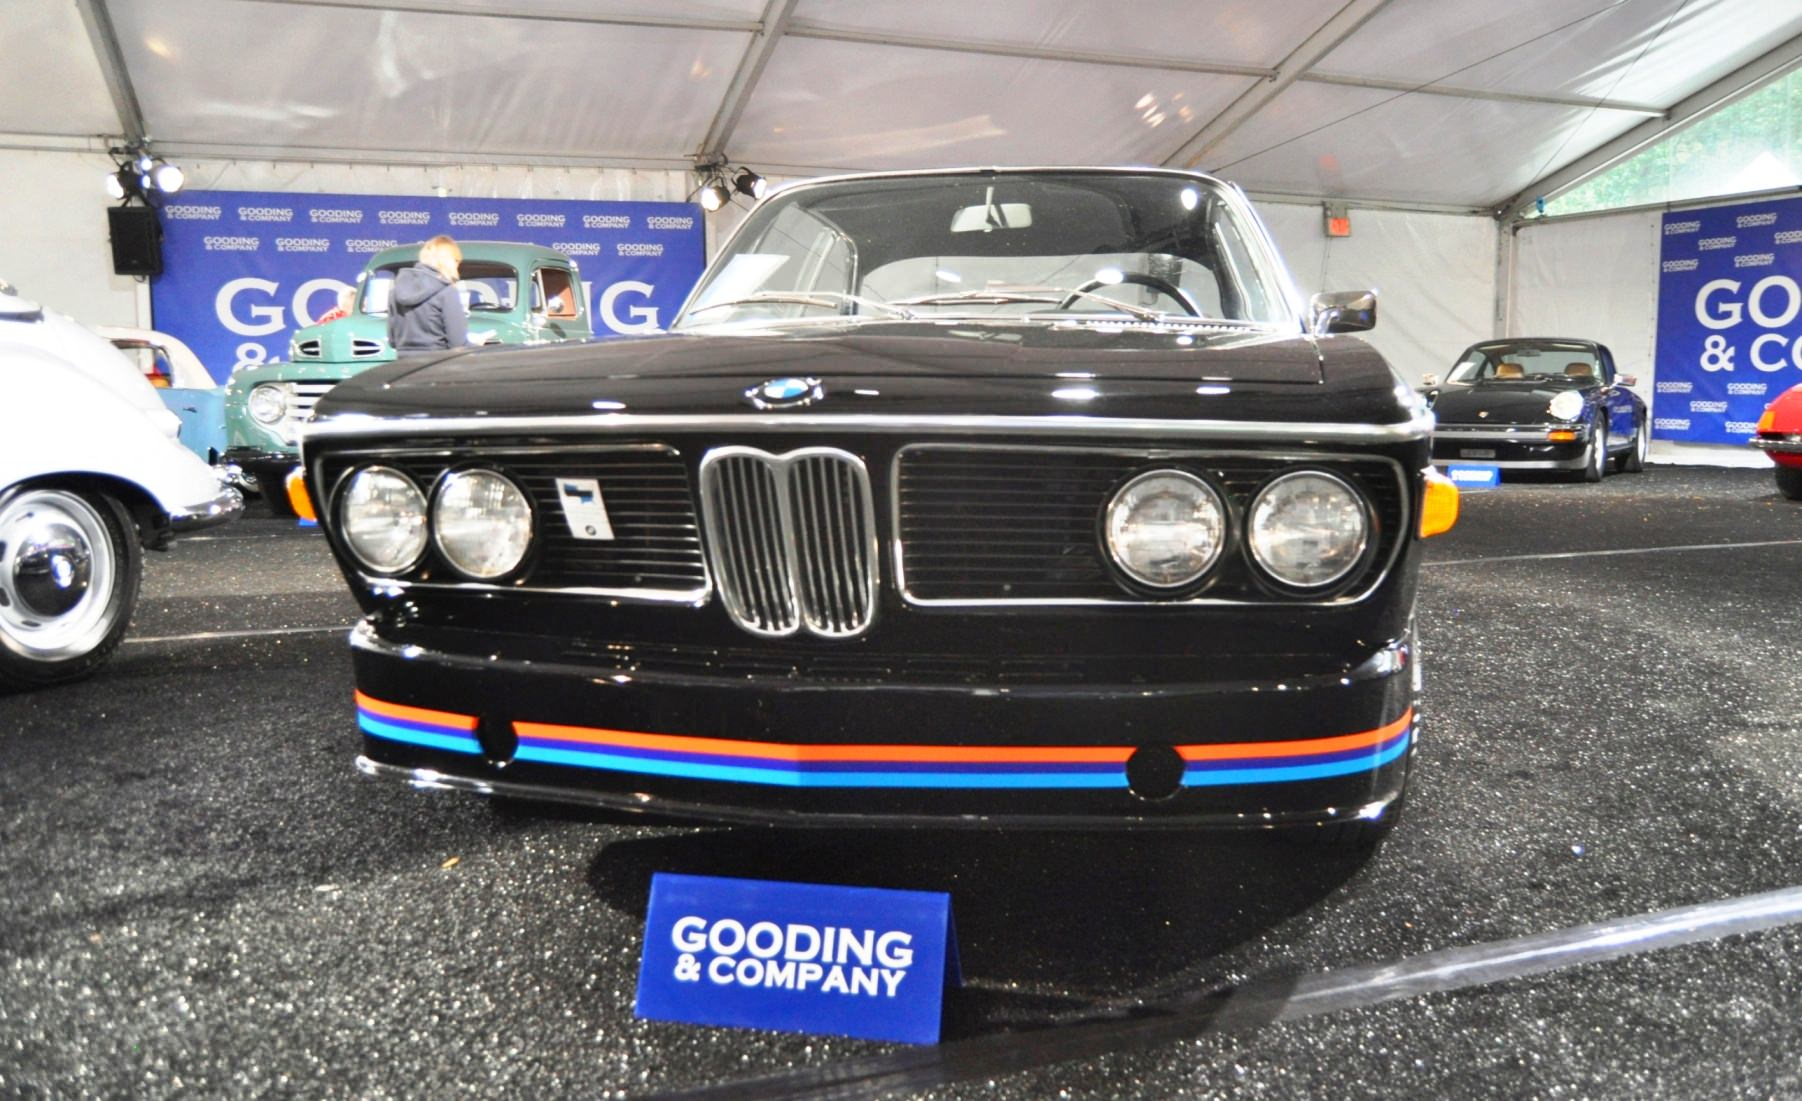 Car-Revs-Daily.com -- 2014 Gooding & Co. -- Flawless 1972 BMW 3.0 CSL -- 67 High-Res Photos 4